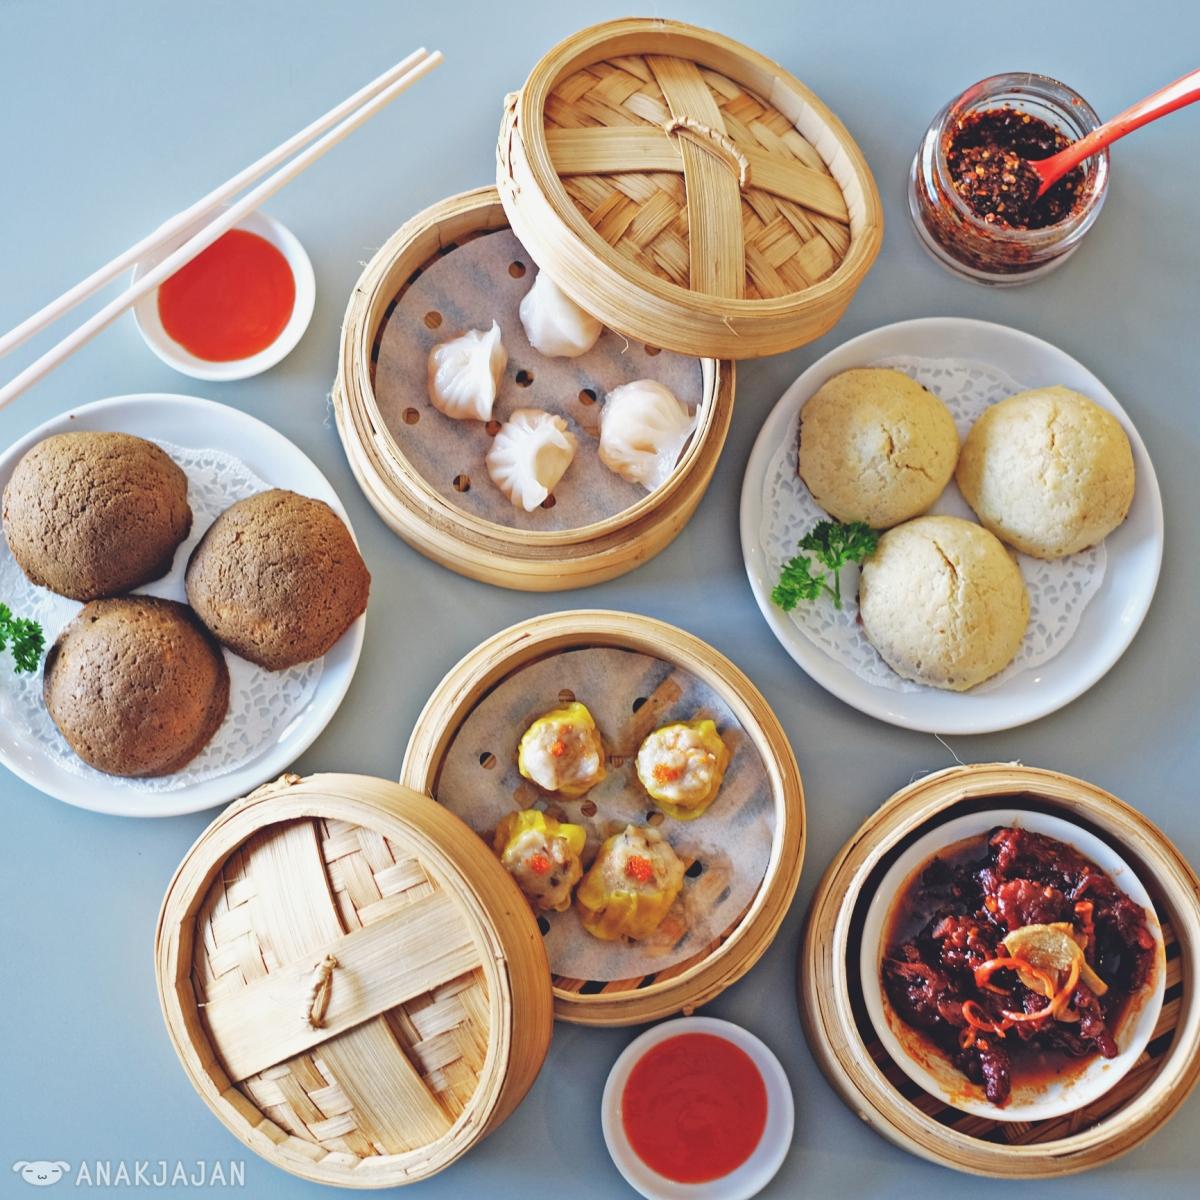 D'Lantern Chinese Cuisine And Dim Sum